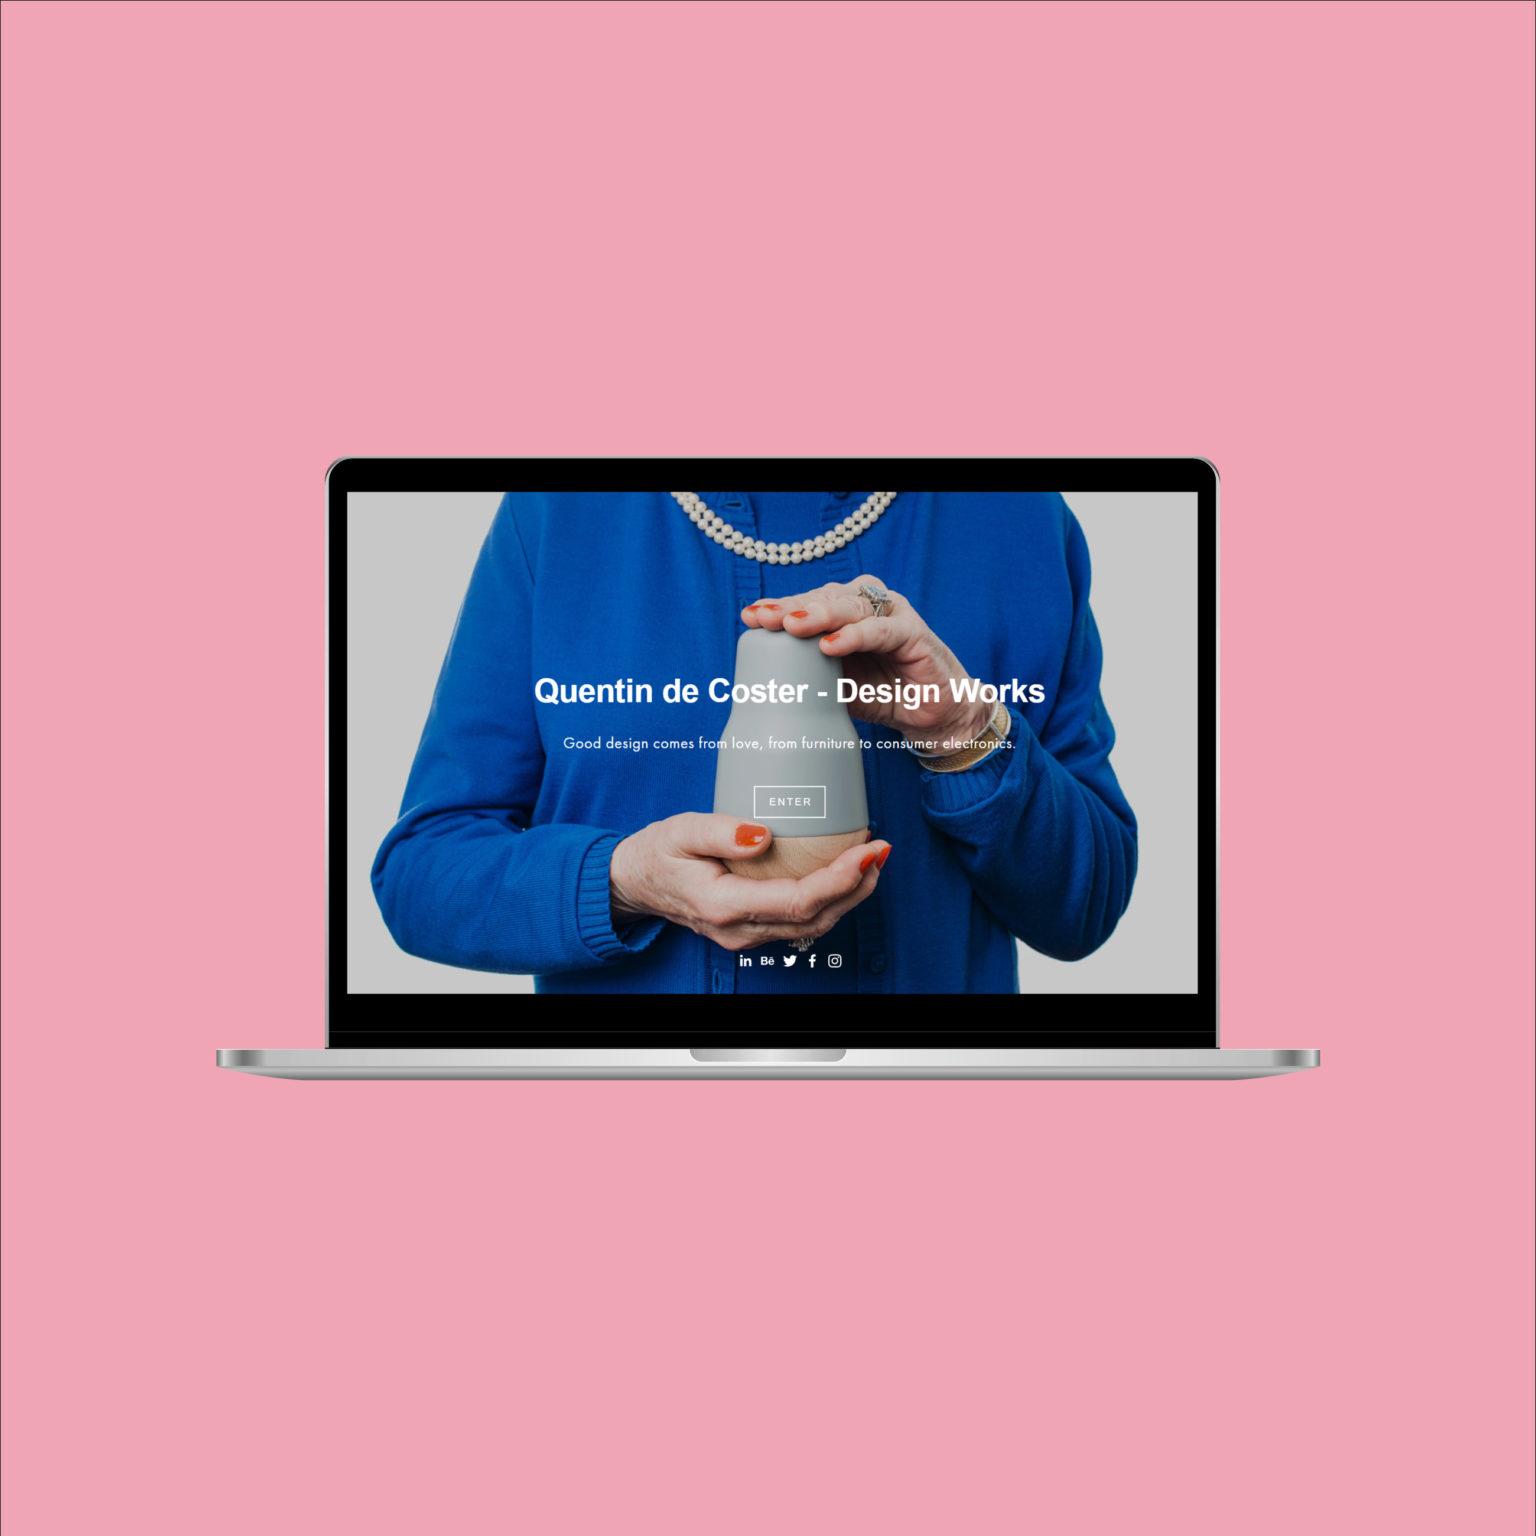 Miko Digital Agence web à Liège - Quentin De Coster